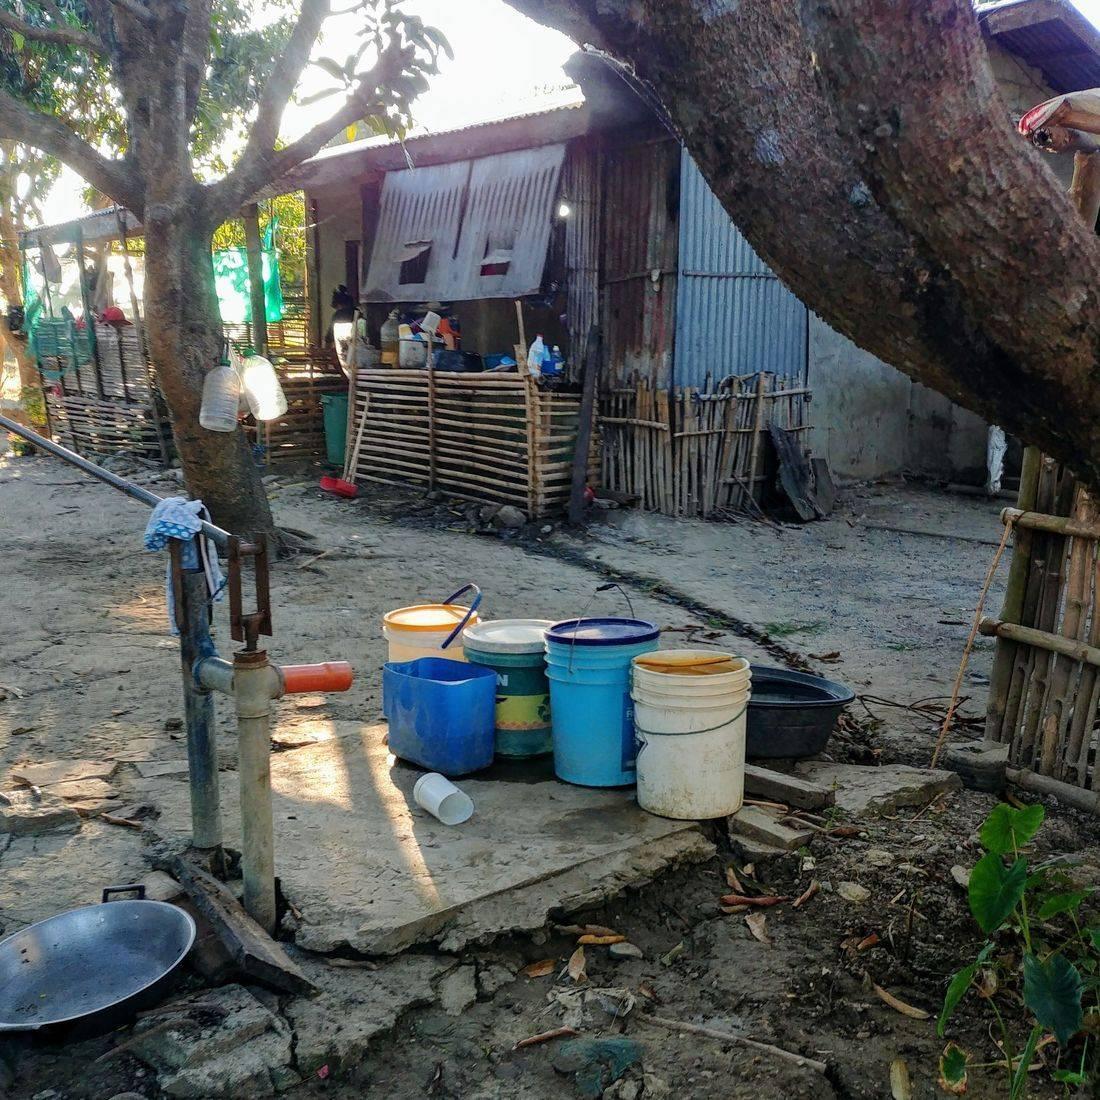 farm house, rest house, mango farm for sale in talugtug nueva ecija, rush sale 10 hectares mango farm in nueva ecija, british & far east traders, mango farm with mountain views of cuyapo